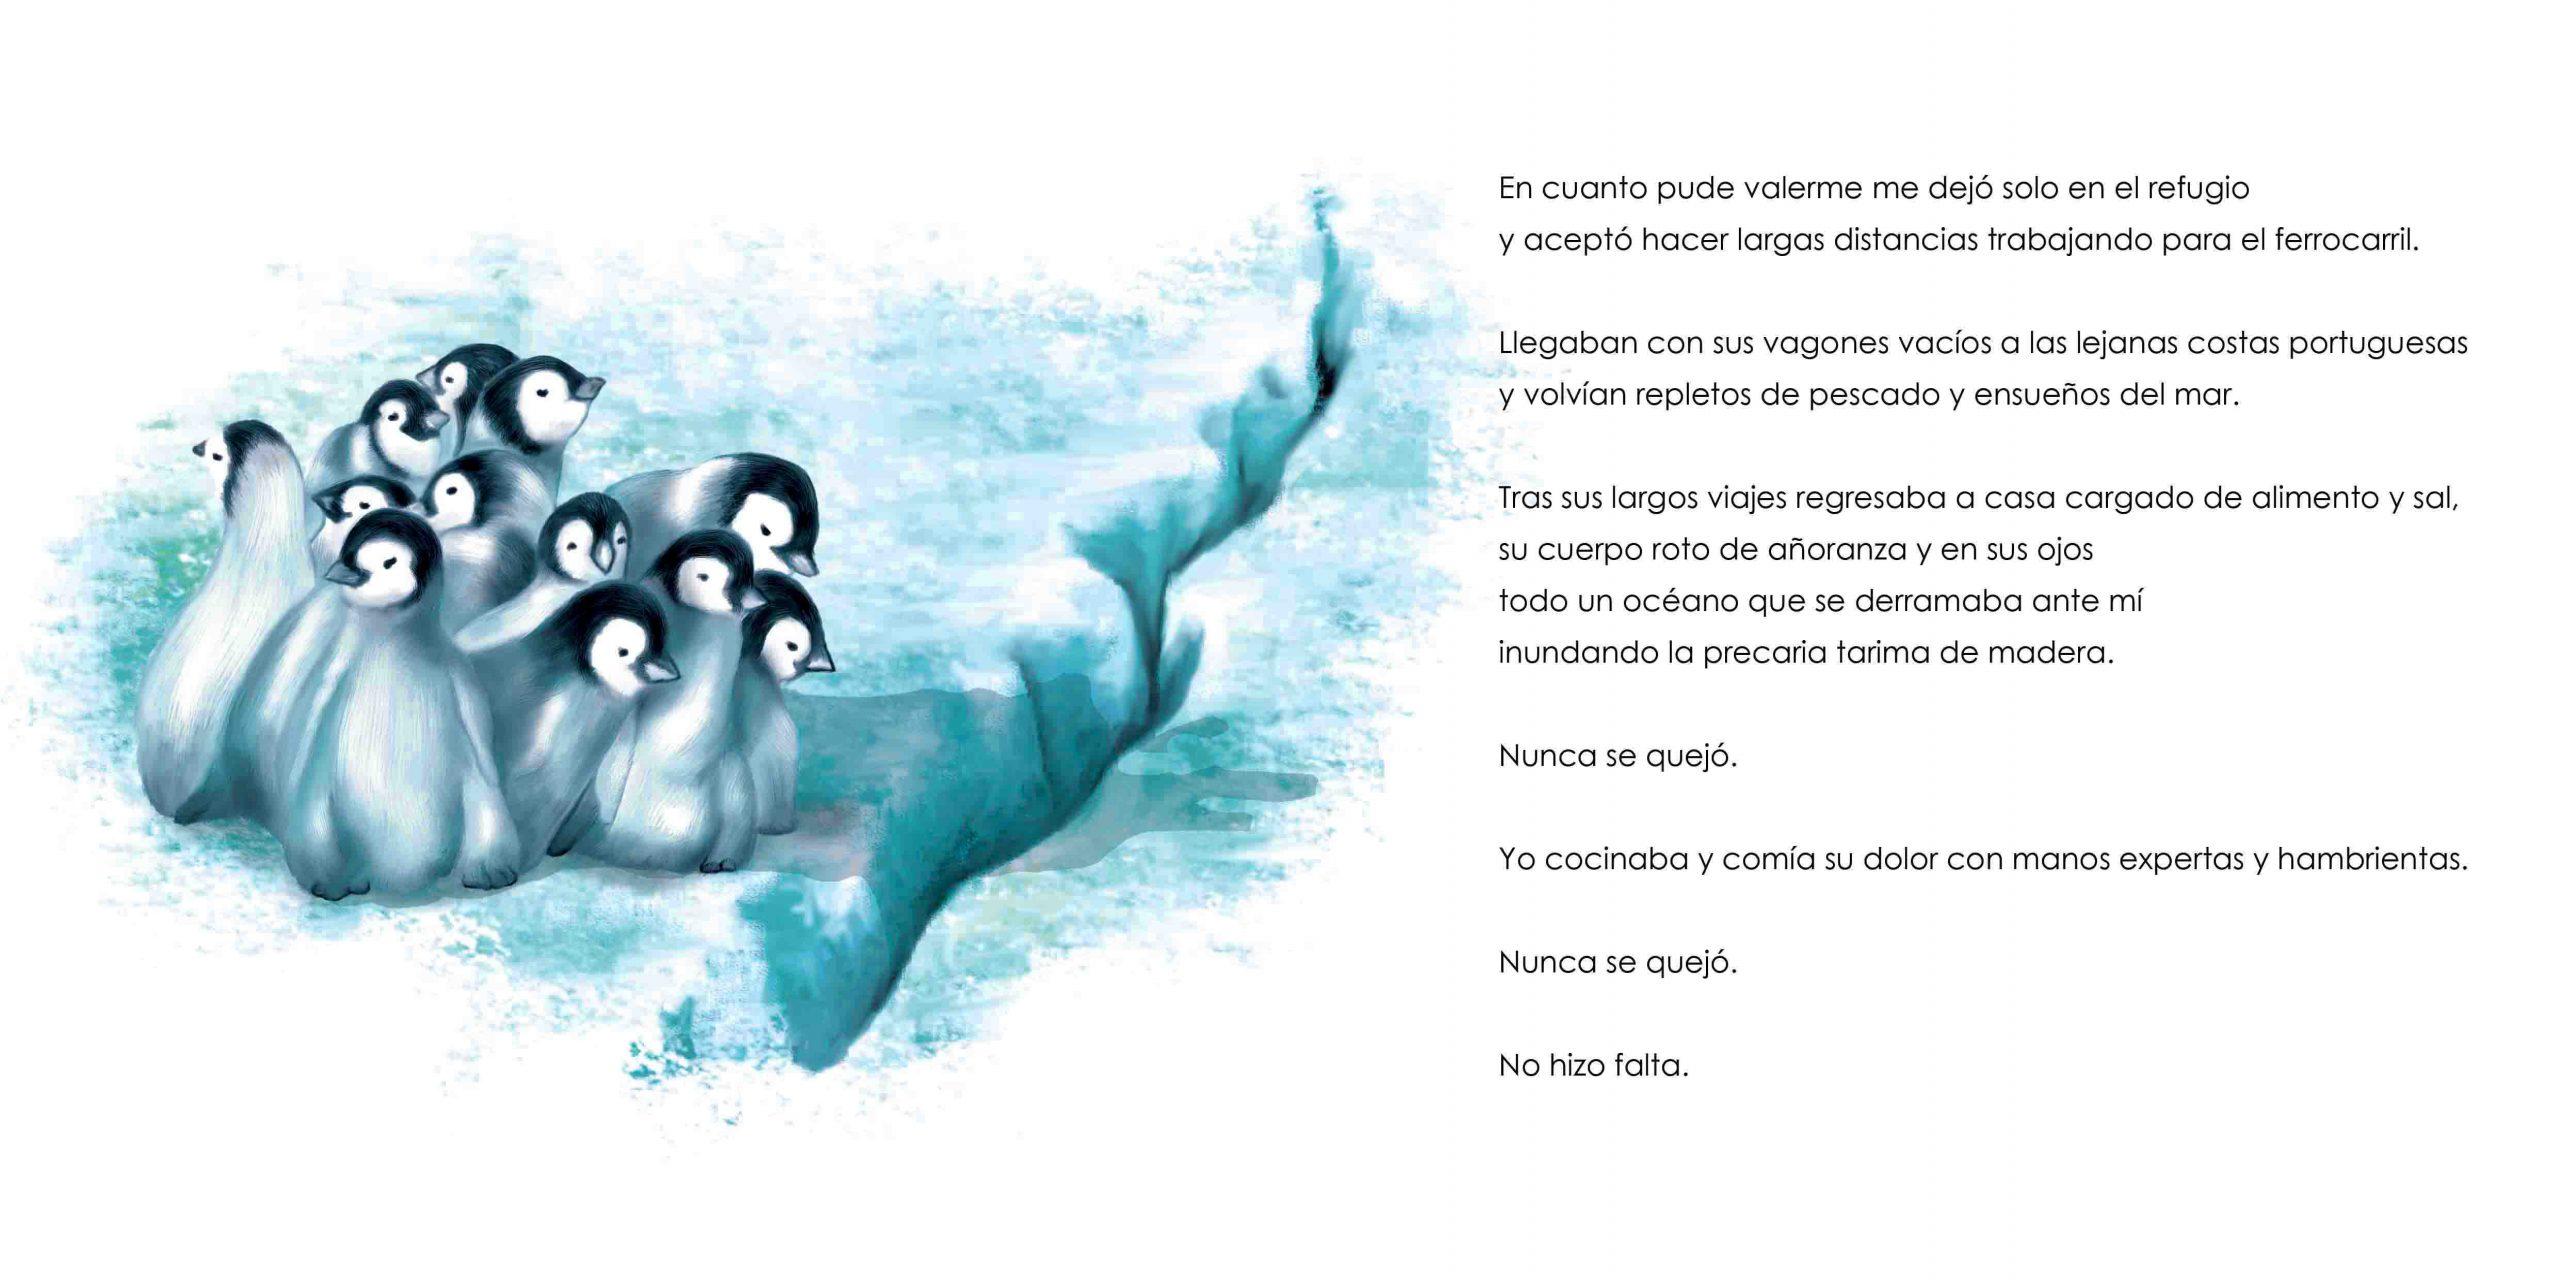 Mi Padre era Pescador Illustrated Album by Vivian Leila Campillo 22_23